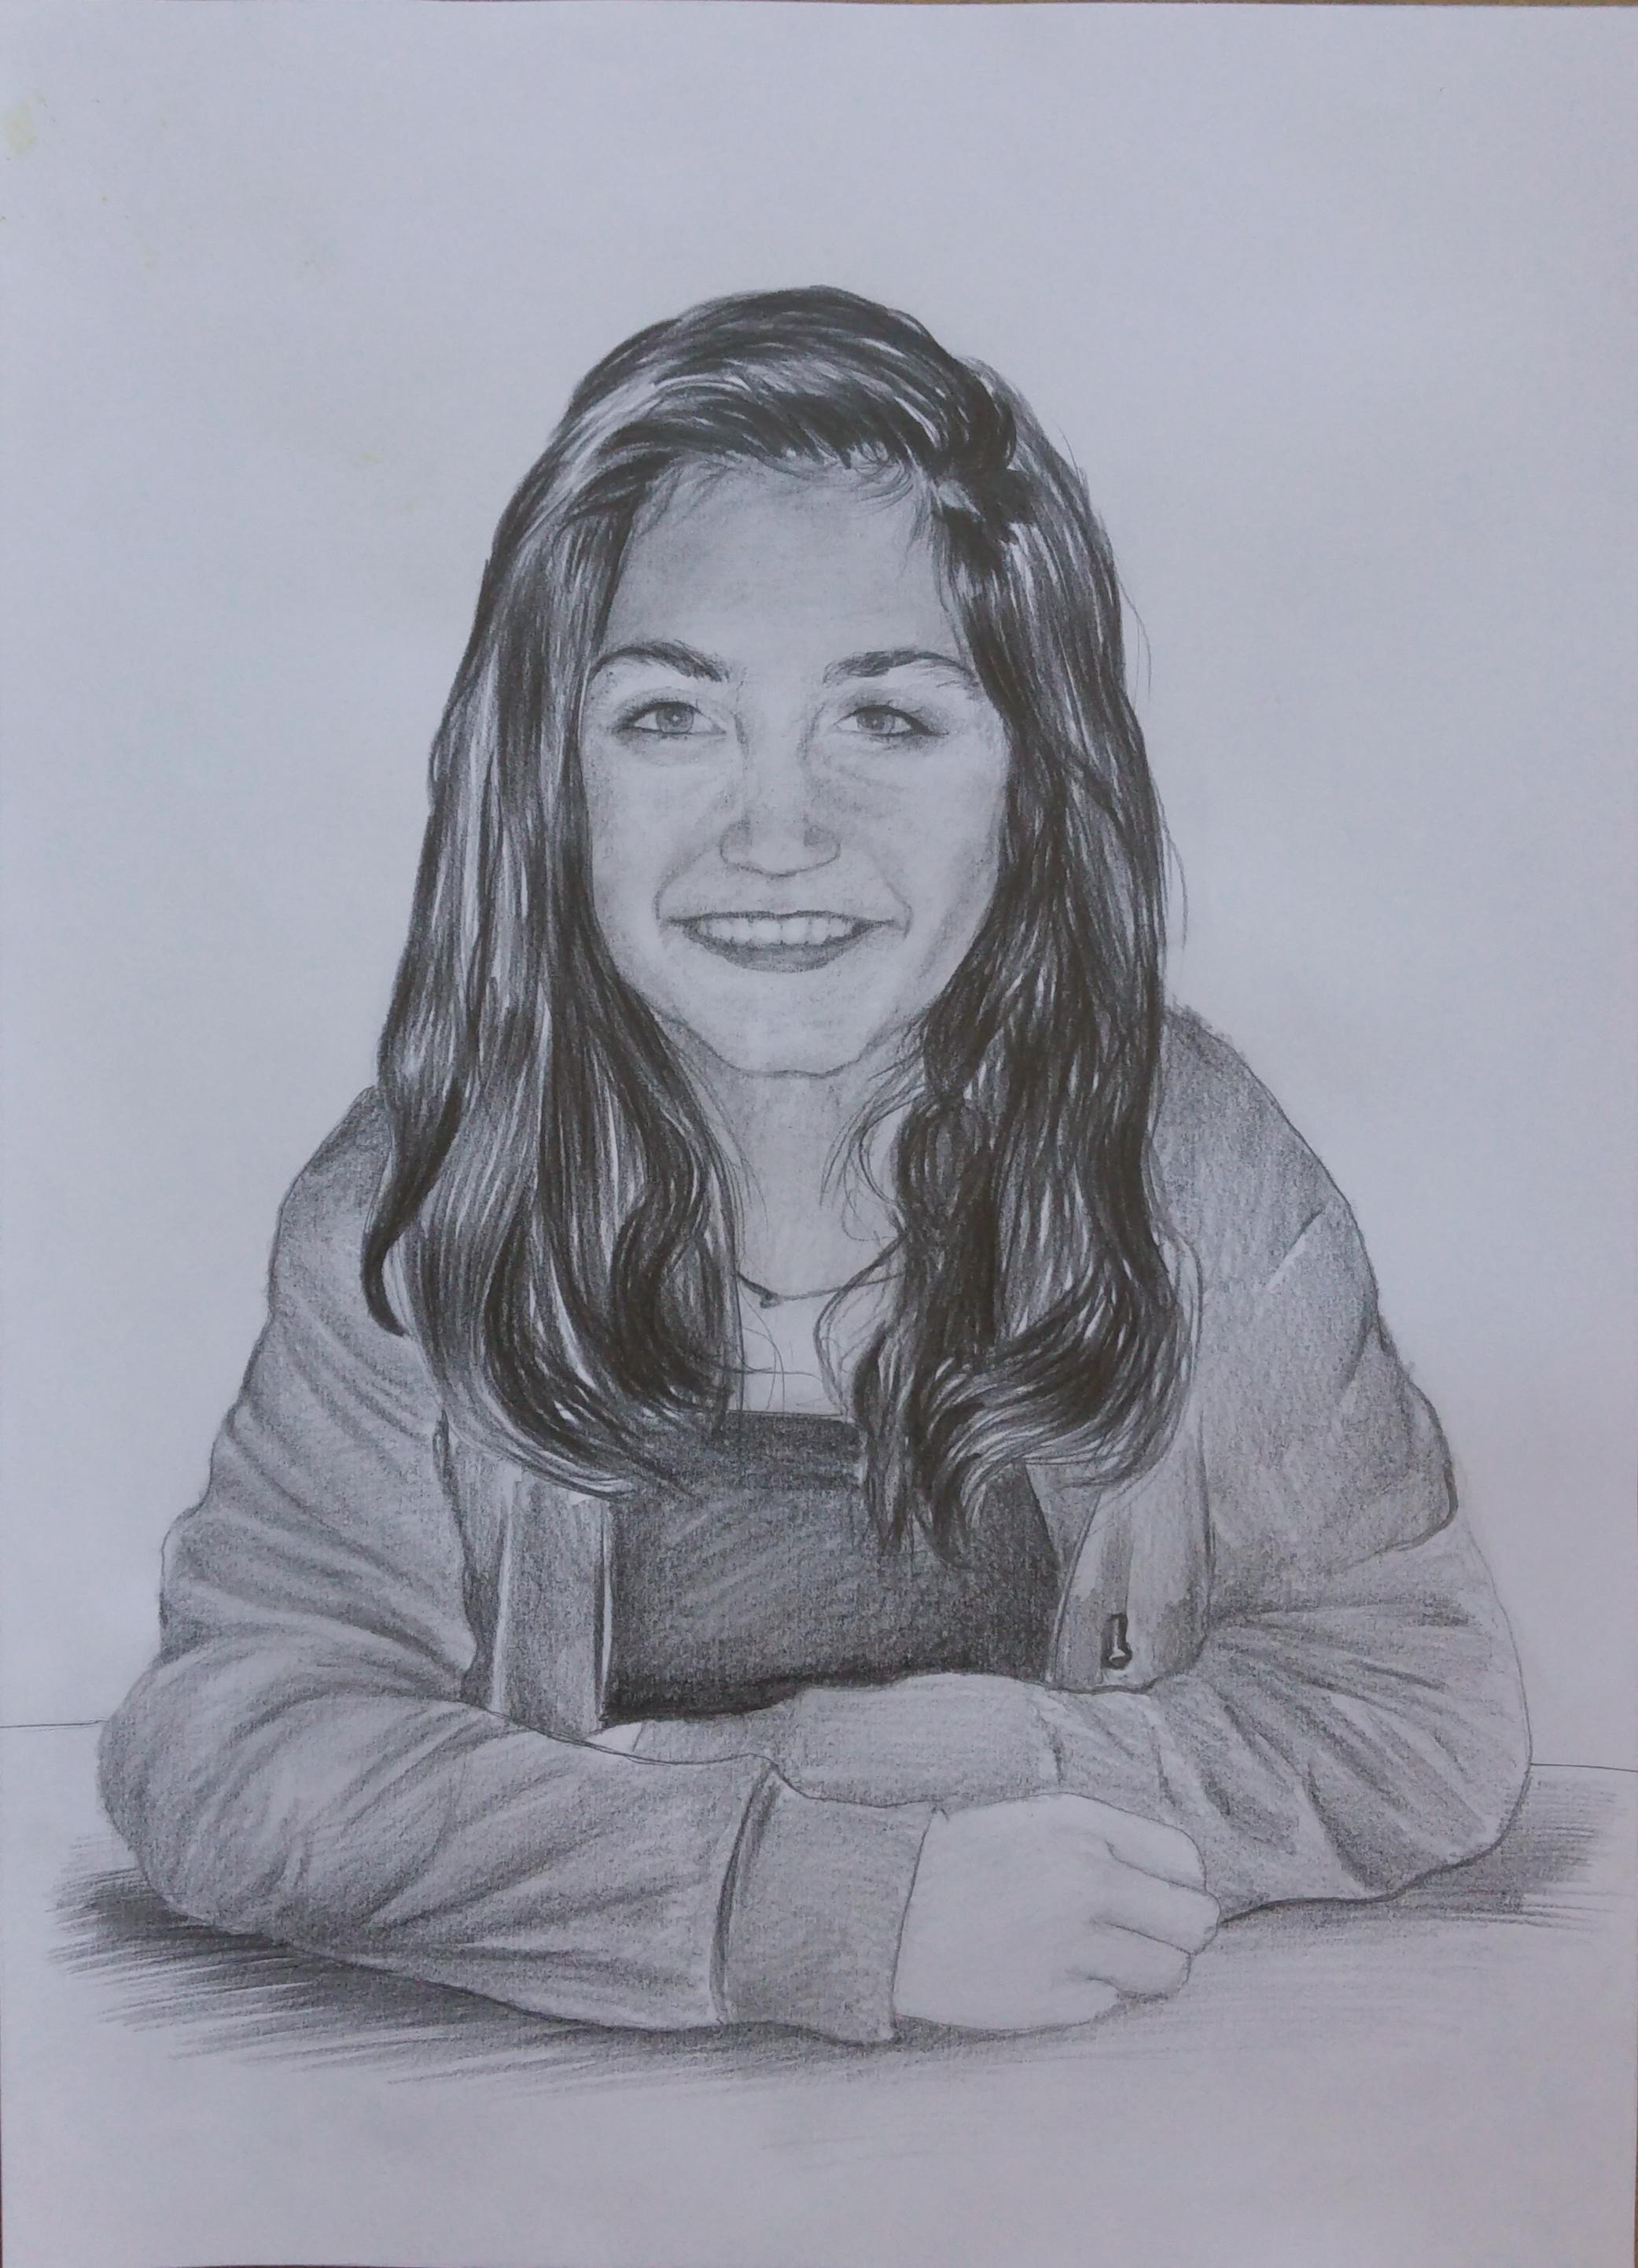 karakalem portre çizim